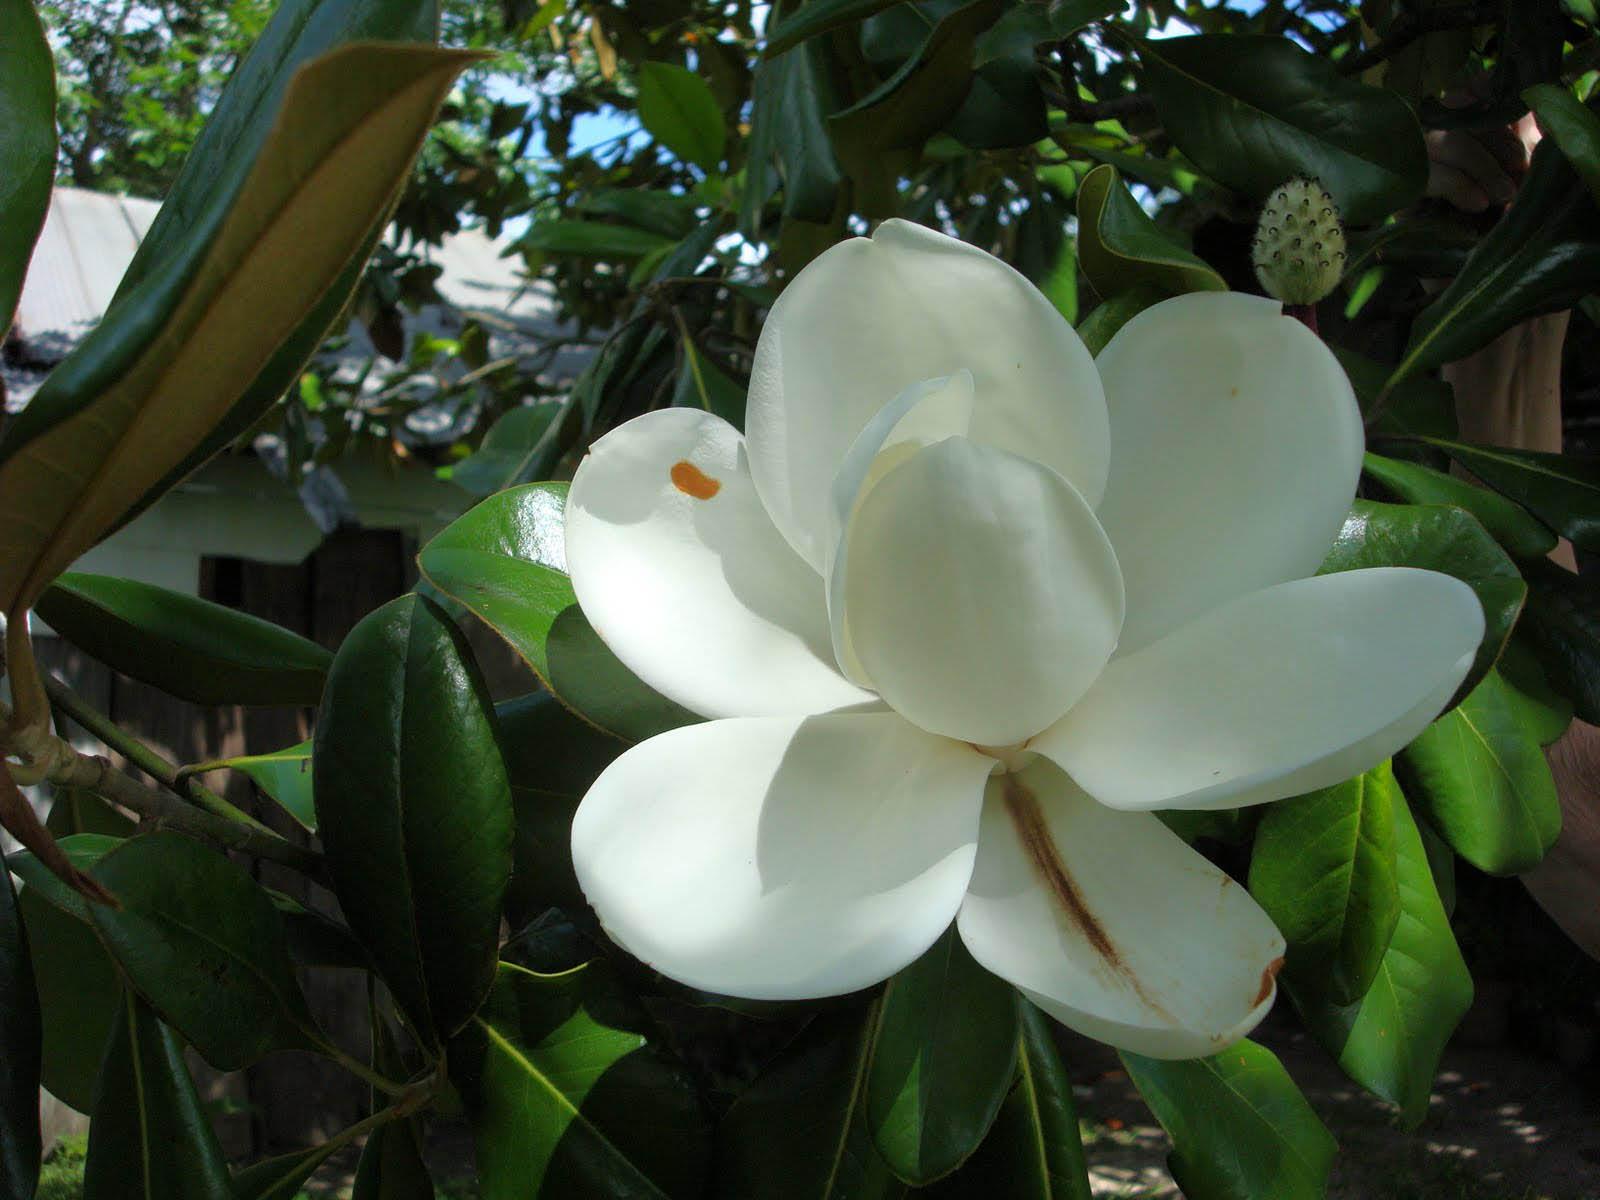 wallpaper: Magnolia Blossom: wallpaperstone.blogspot.com/2012/07/magnolia-blossom.html